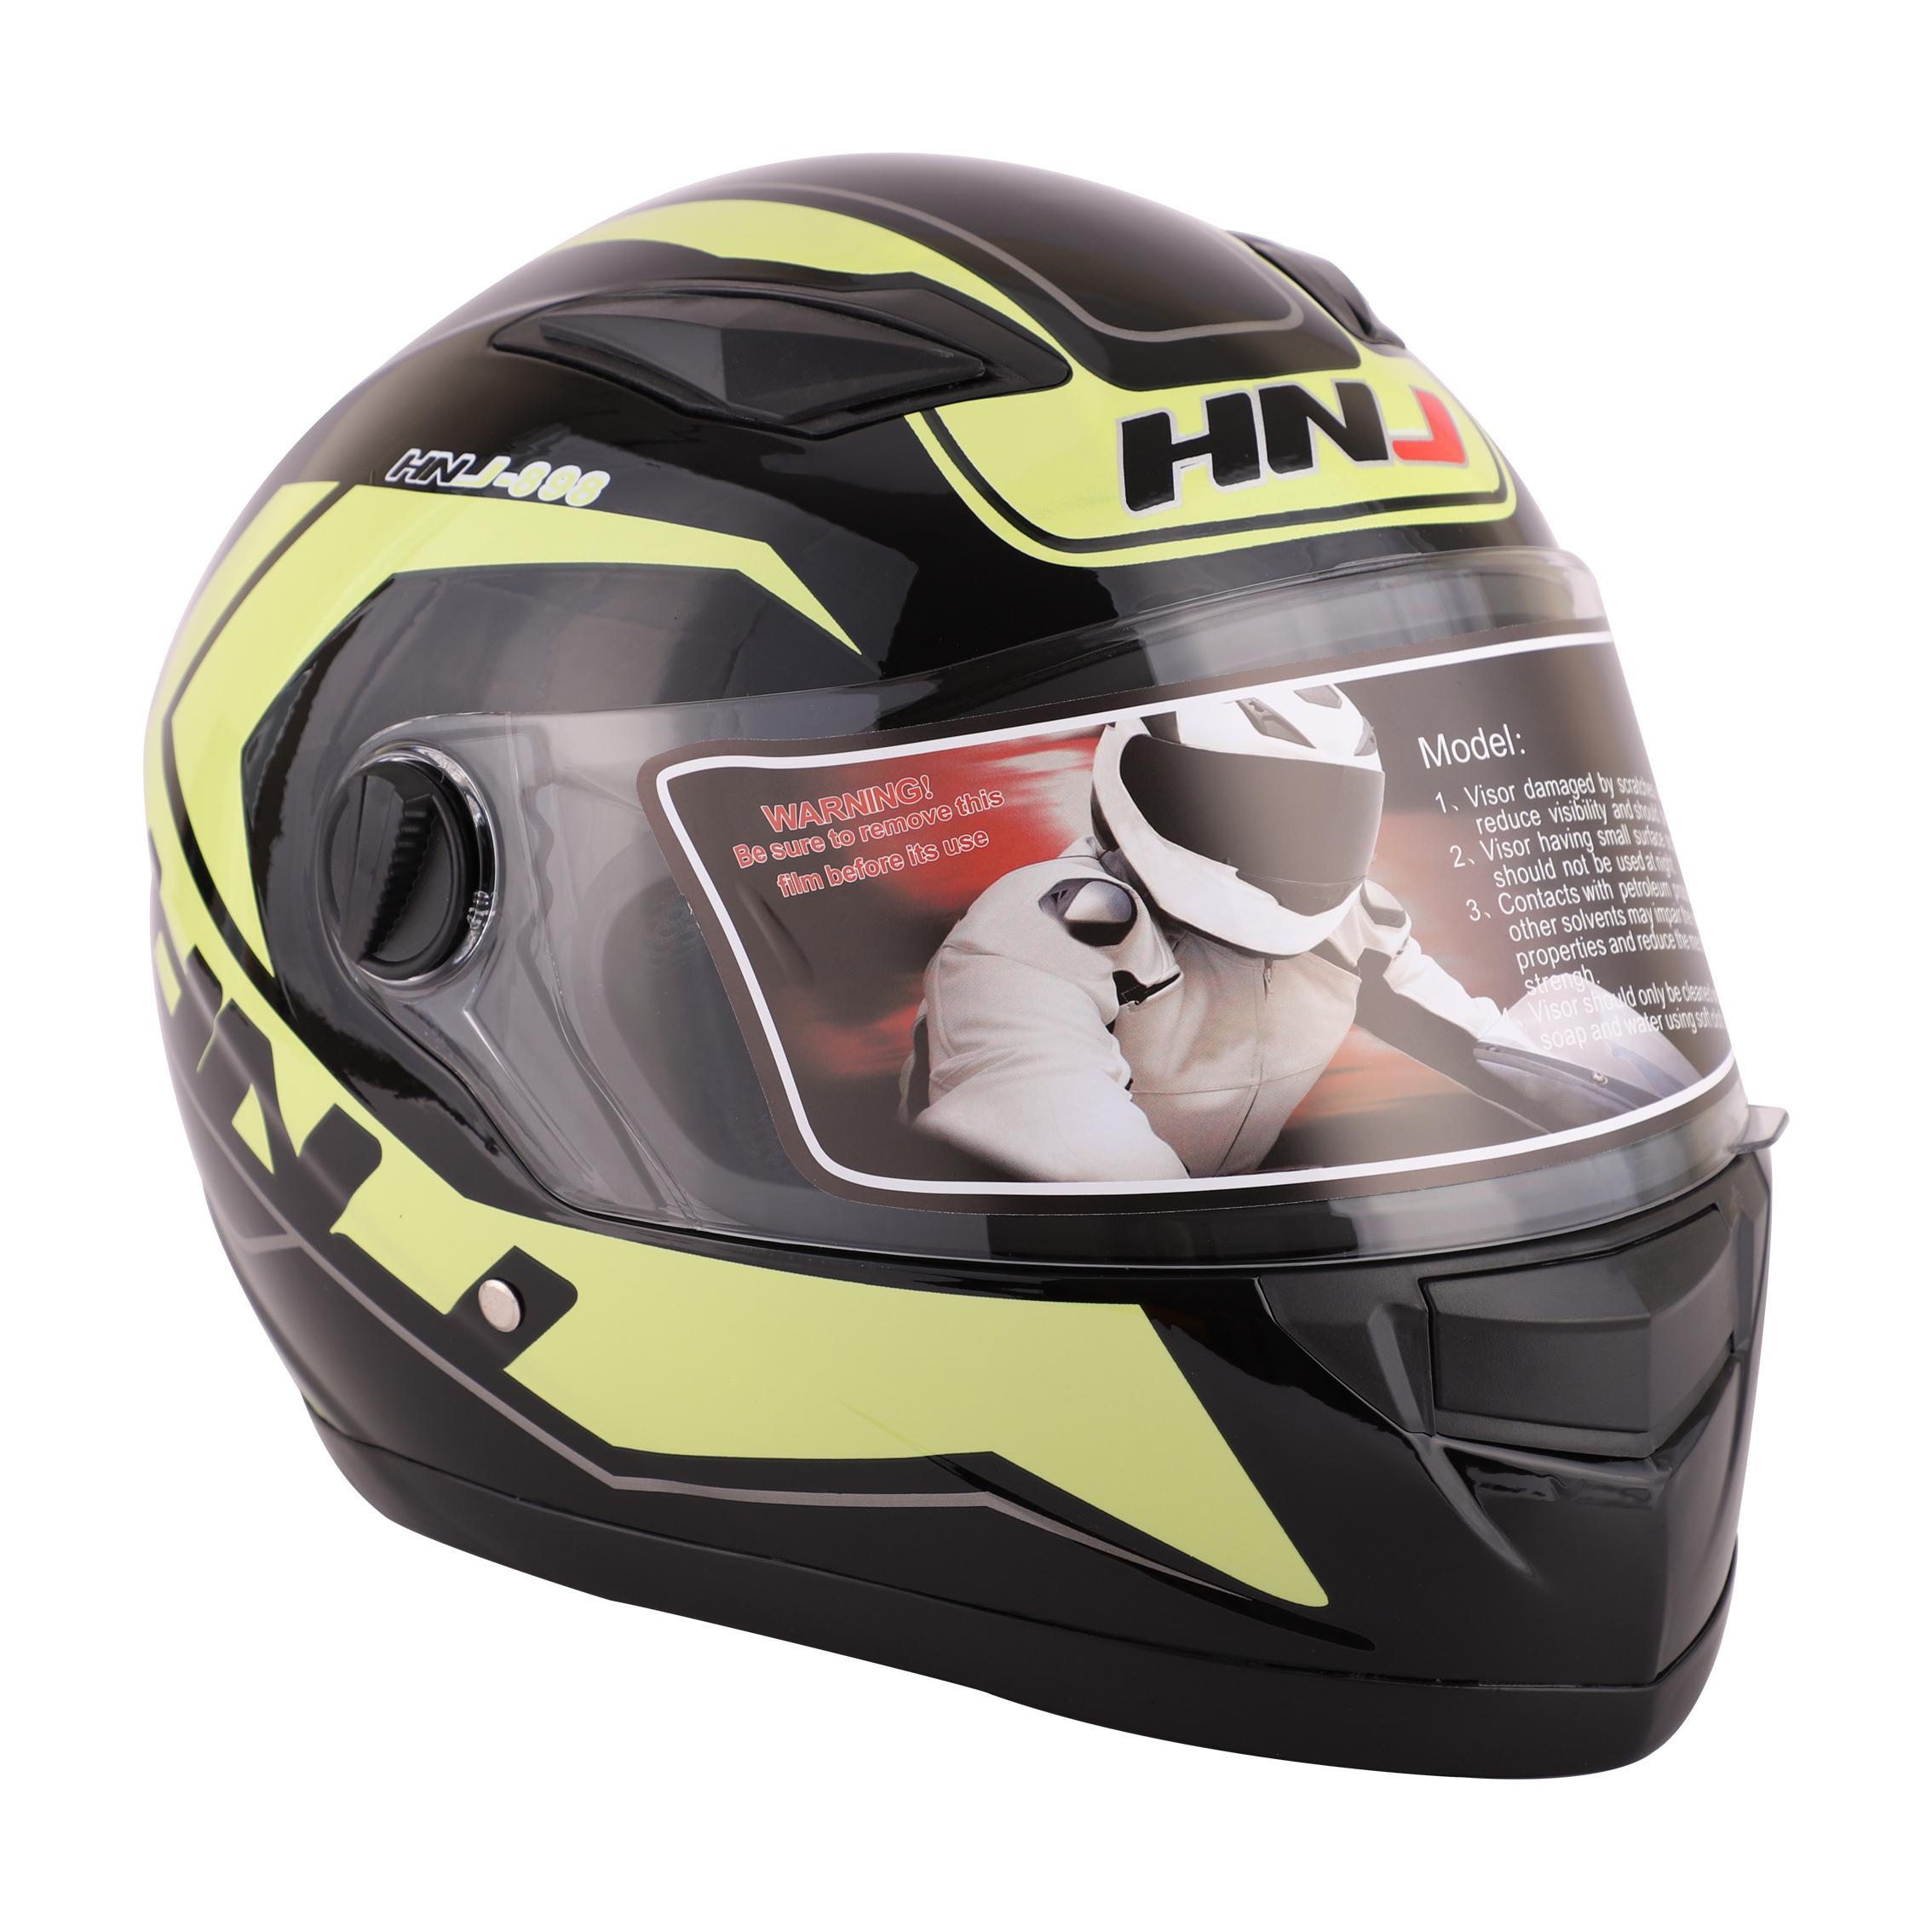 577a687d Product details of HNJ Helmets FF898 Clear Visor Full Face Motorcycle Helmet  Size:Large(59-60cm)